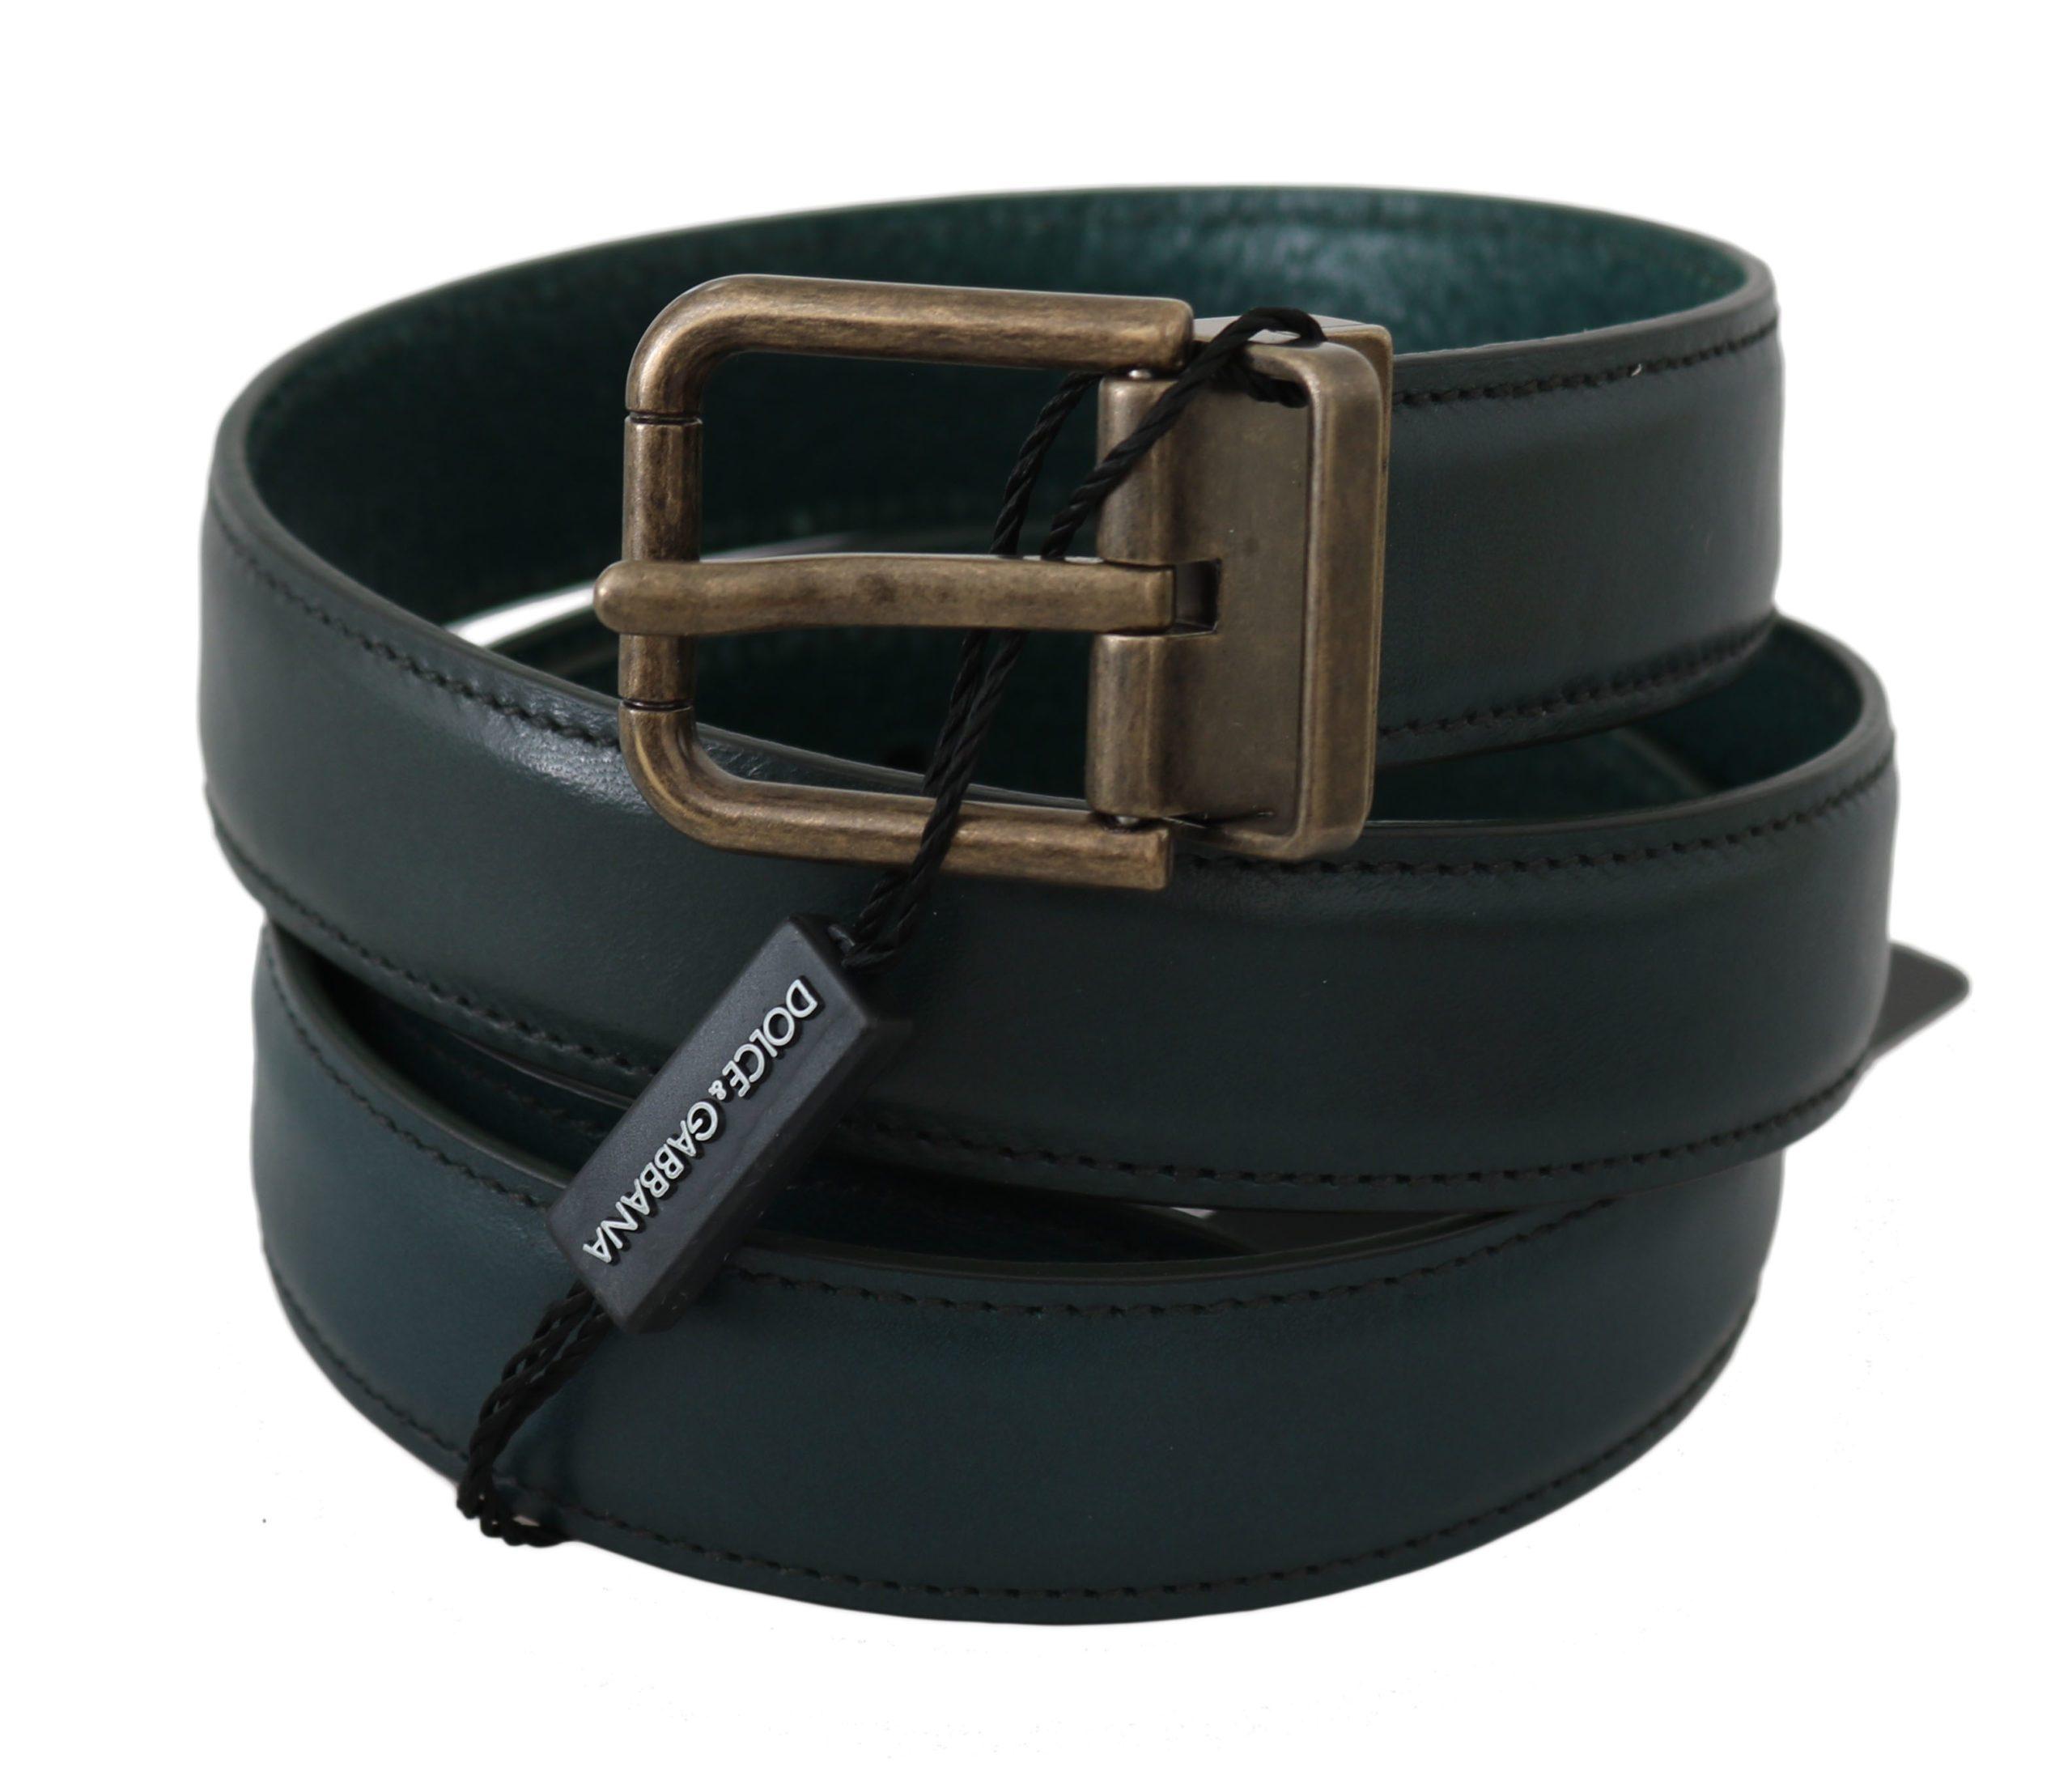 Dolce & Gabbana Men's Calfskin Leather Buckle Belt BEL60348 - 100 cm / 40 Inches